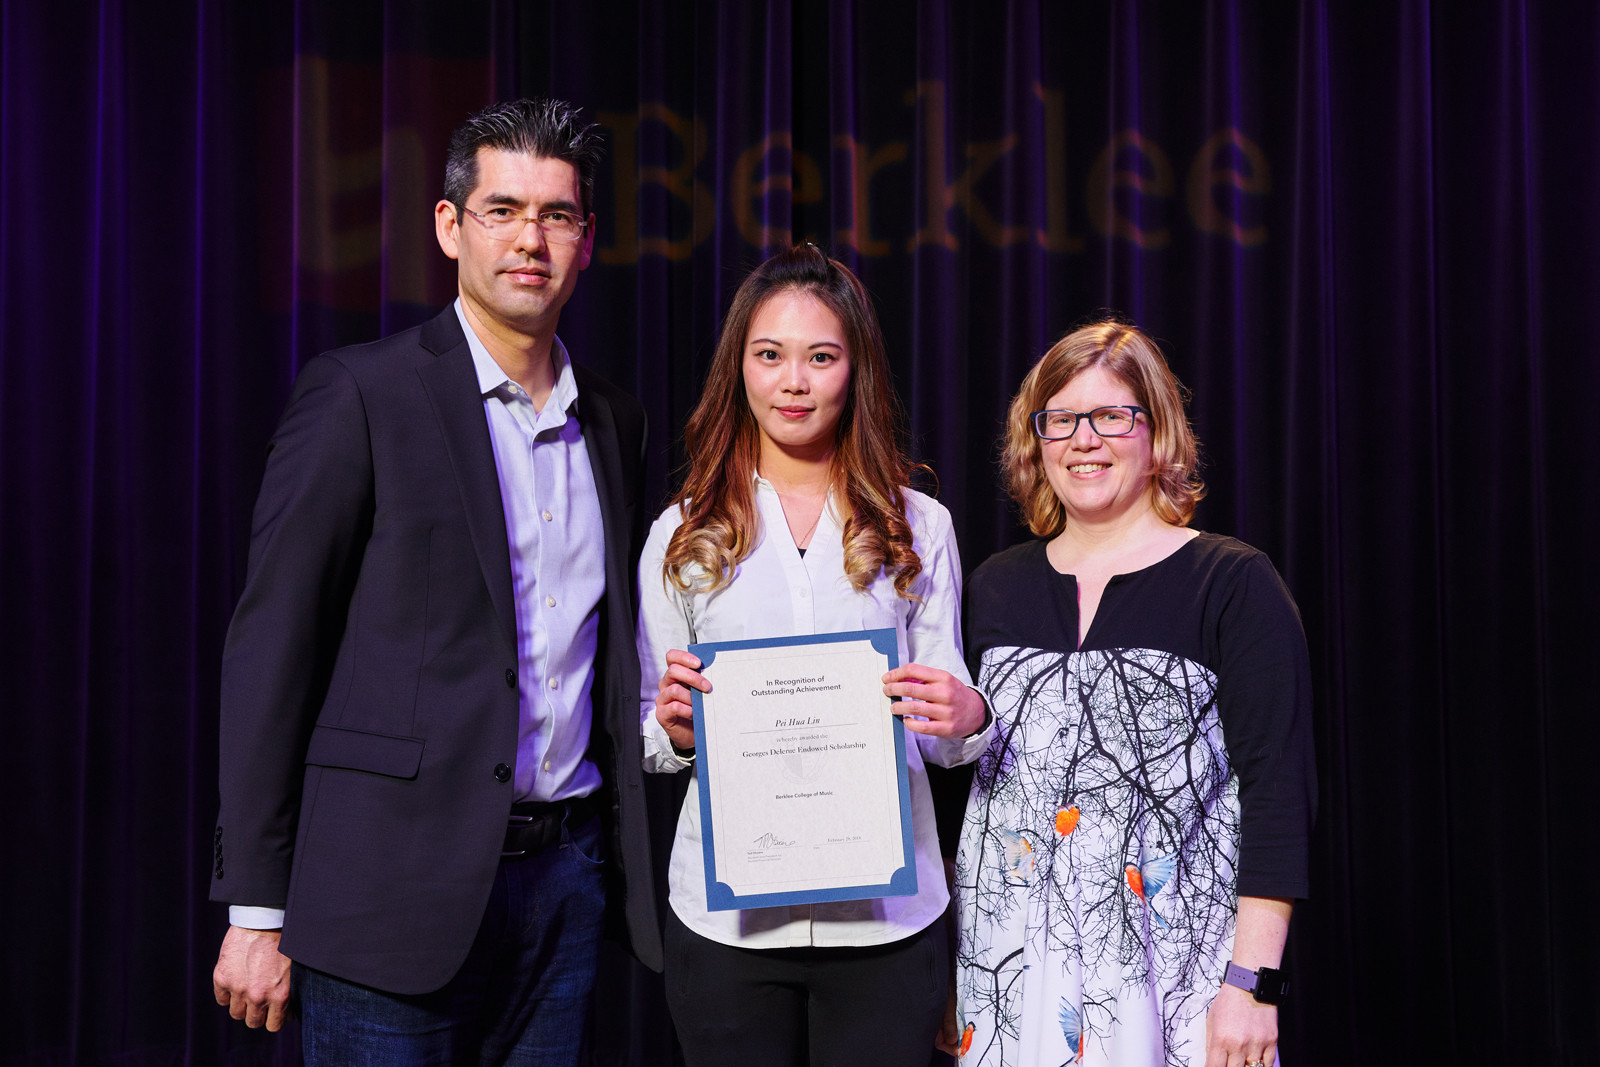 The 2018 Recipient of Georges Delerue Memorial Scholarship Award